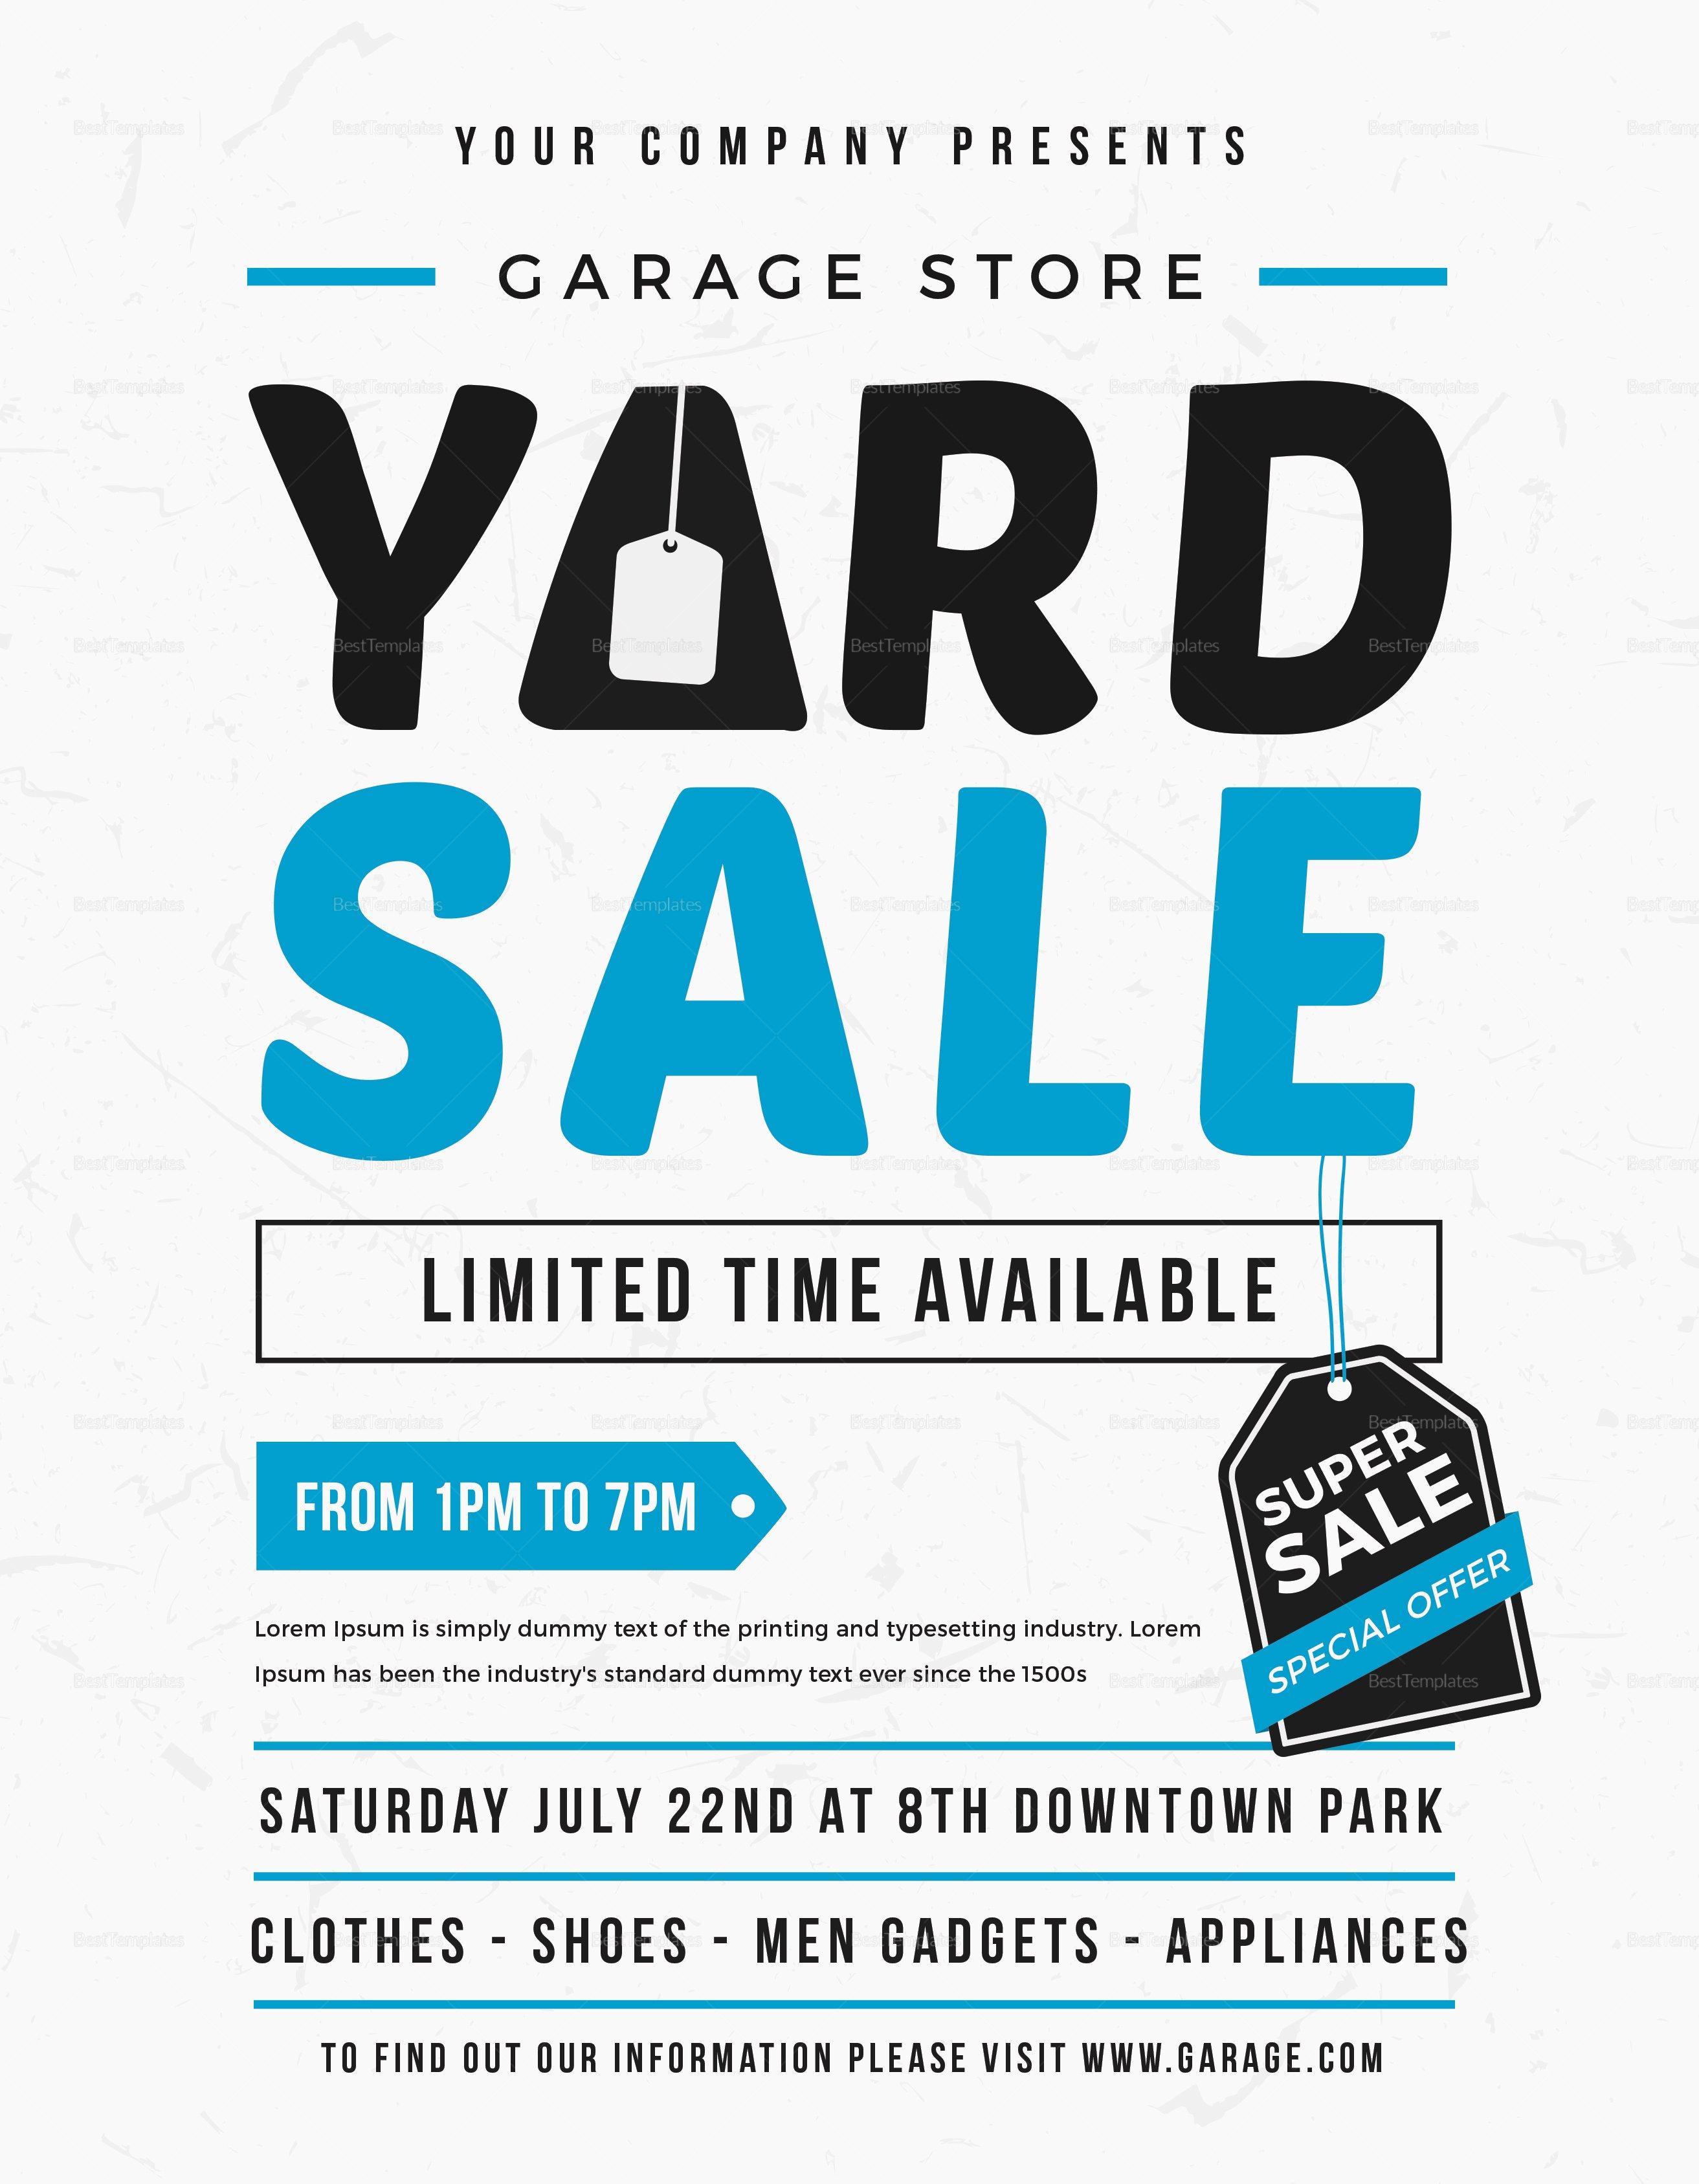 Garage Sale Flyer Template Free Lovely Unique Yard Sale Flyer Design Template In Word Psd Illustrator Publisher